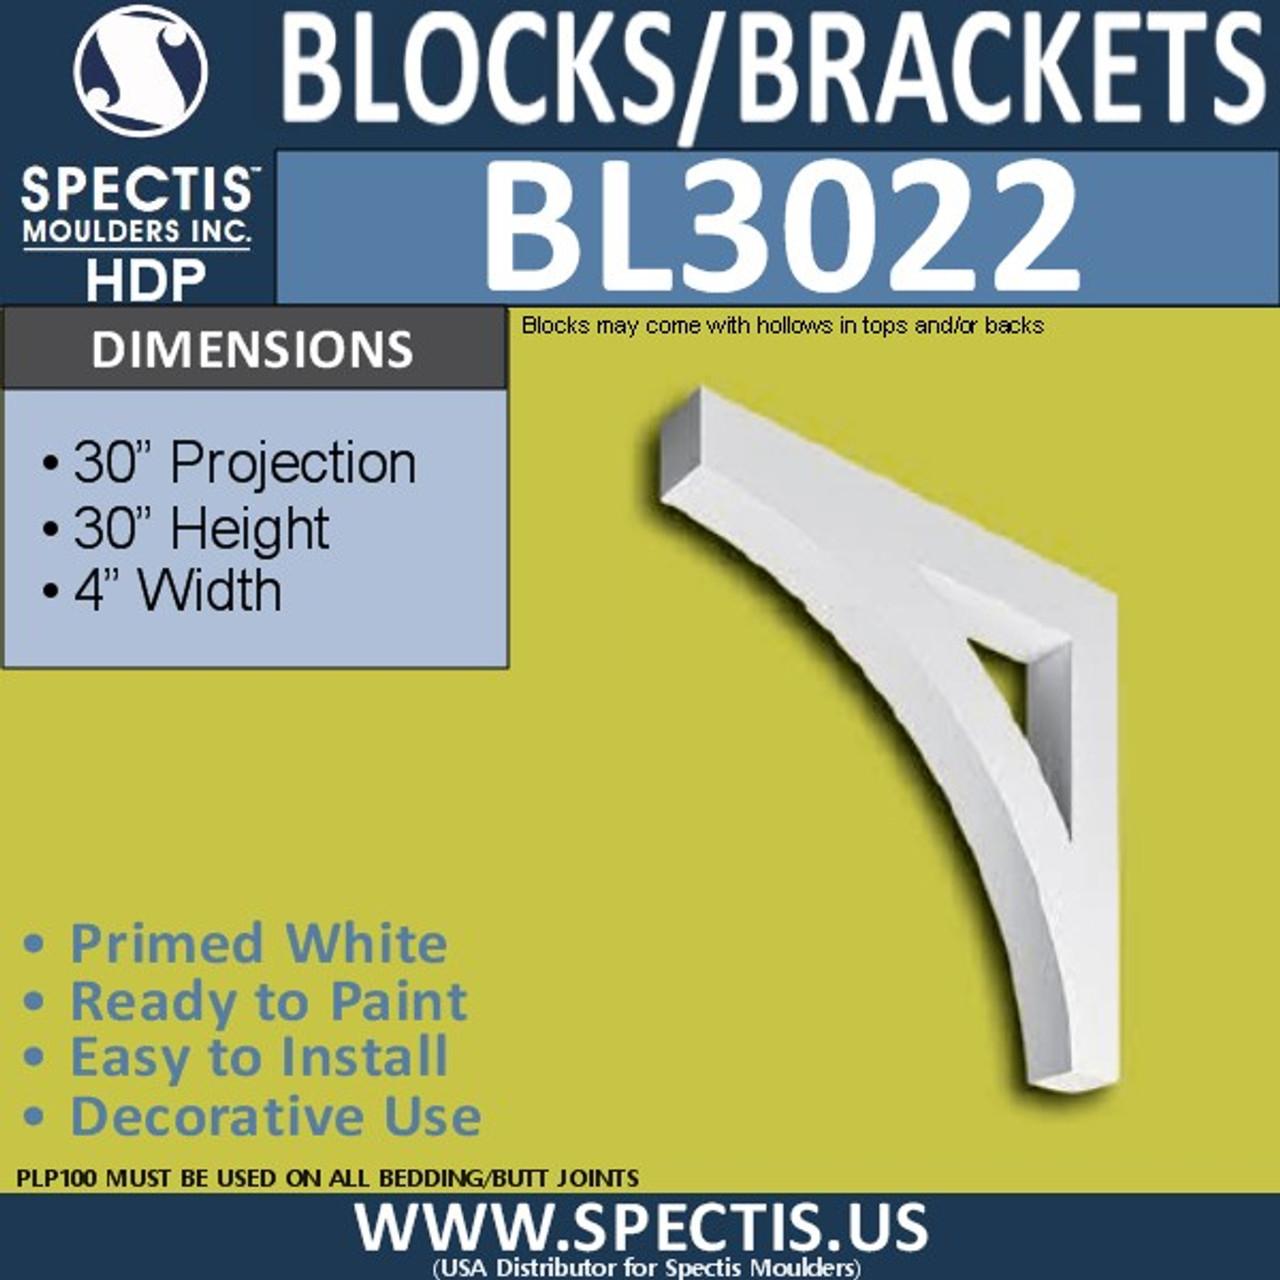 "BL3022 Eave Block or Bracket 4""W x 30""H x 30"" P"